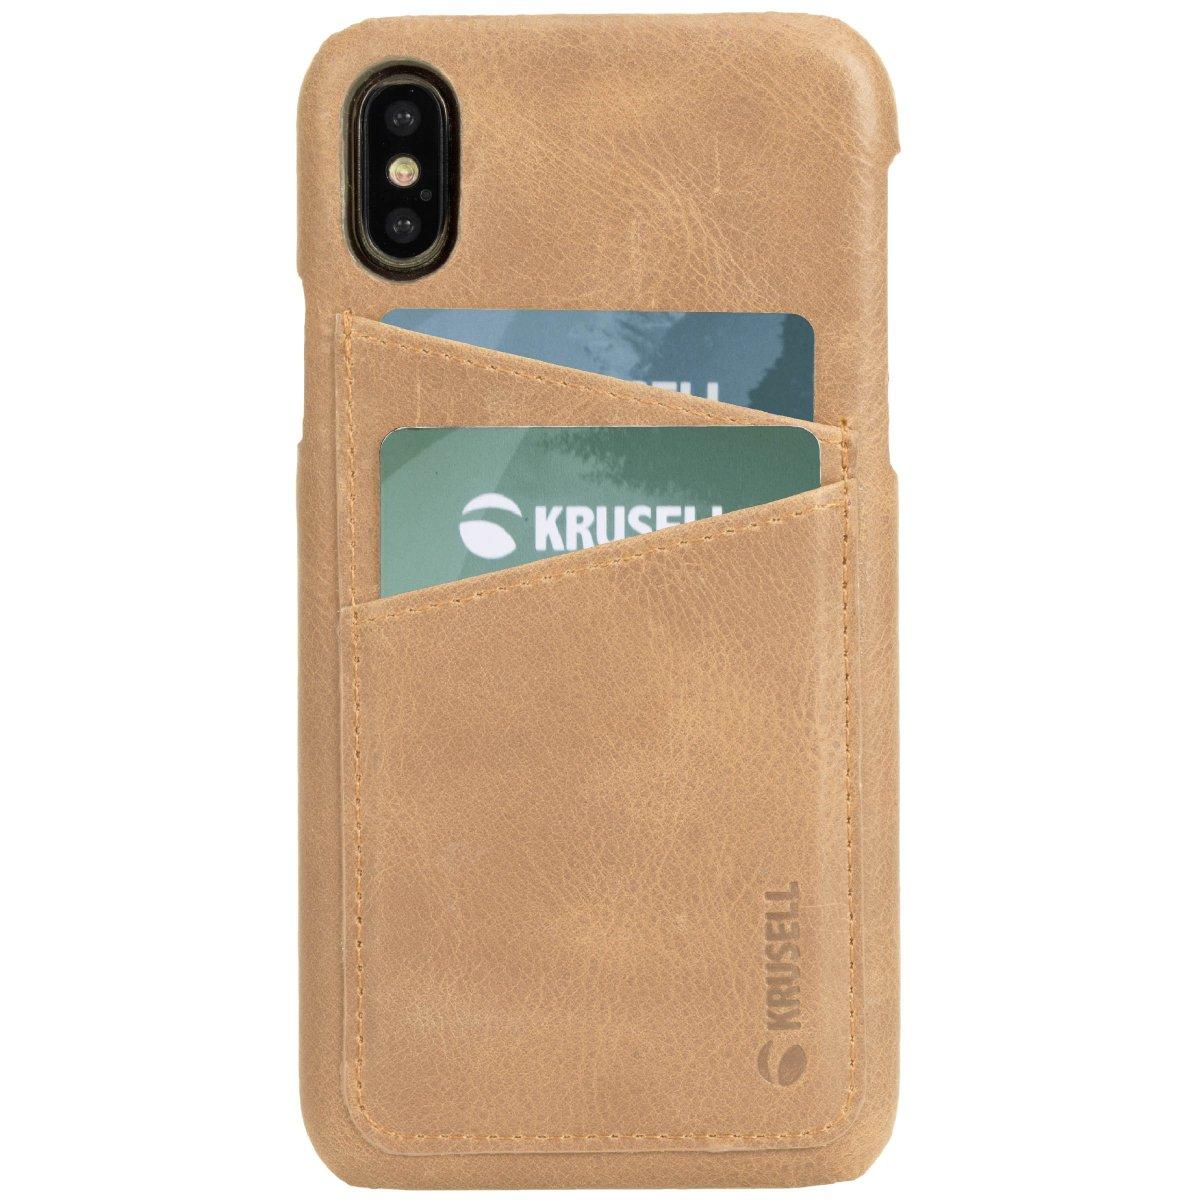 Krusell Sunne Kortfack Skal till iPhone X/Xs Nude